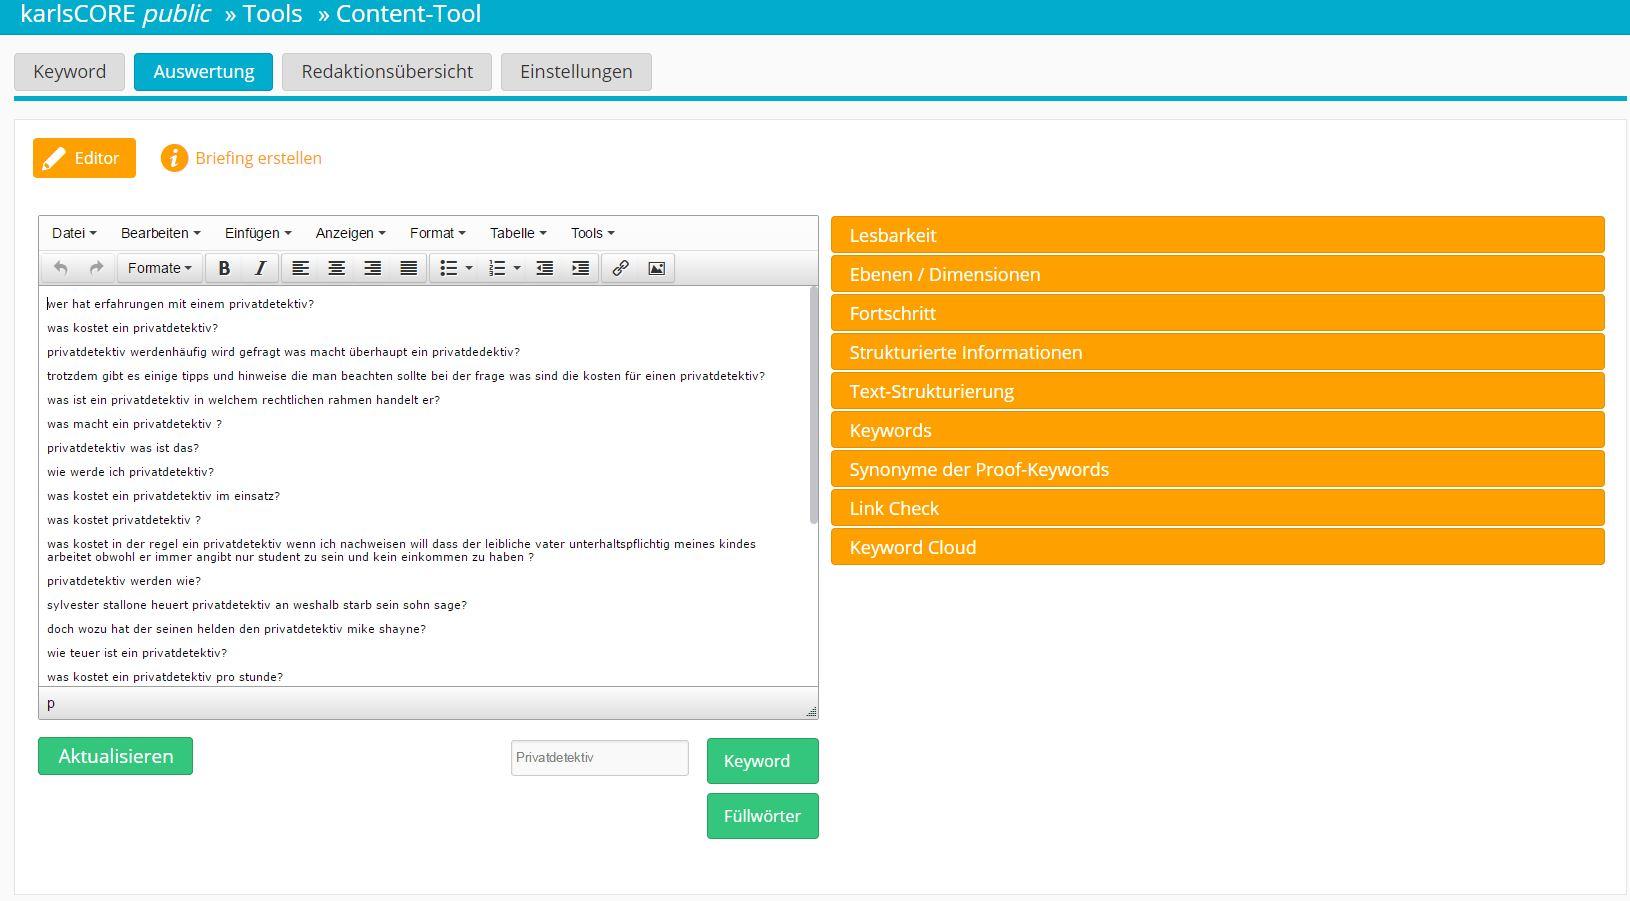 Screenshot_ Content Tool_ Karl Kratz